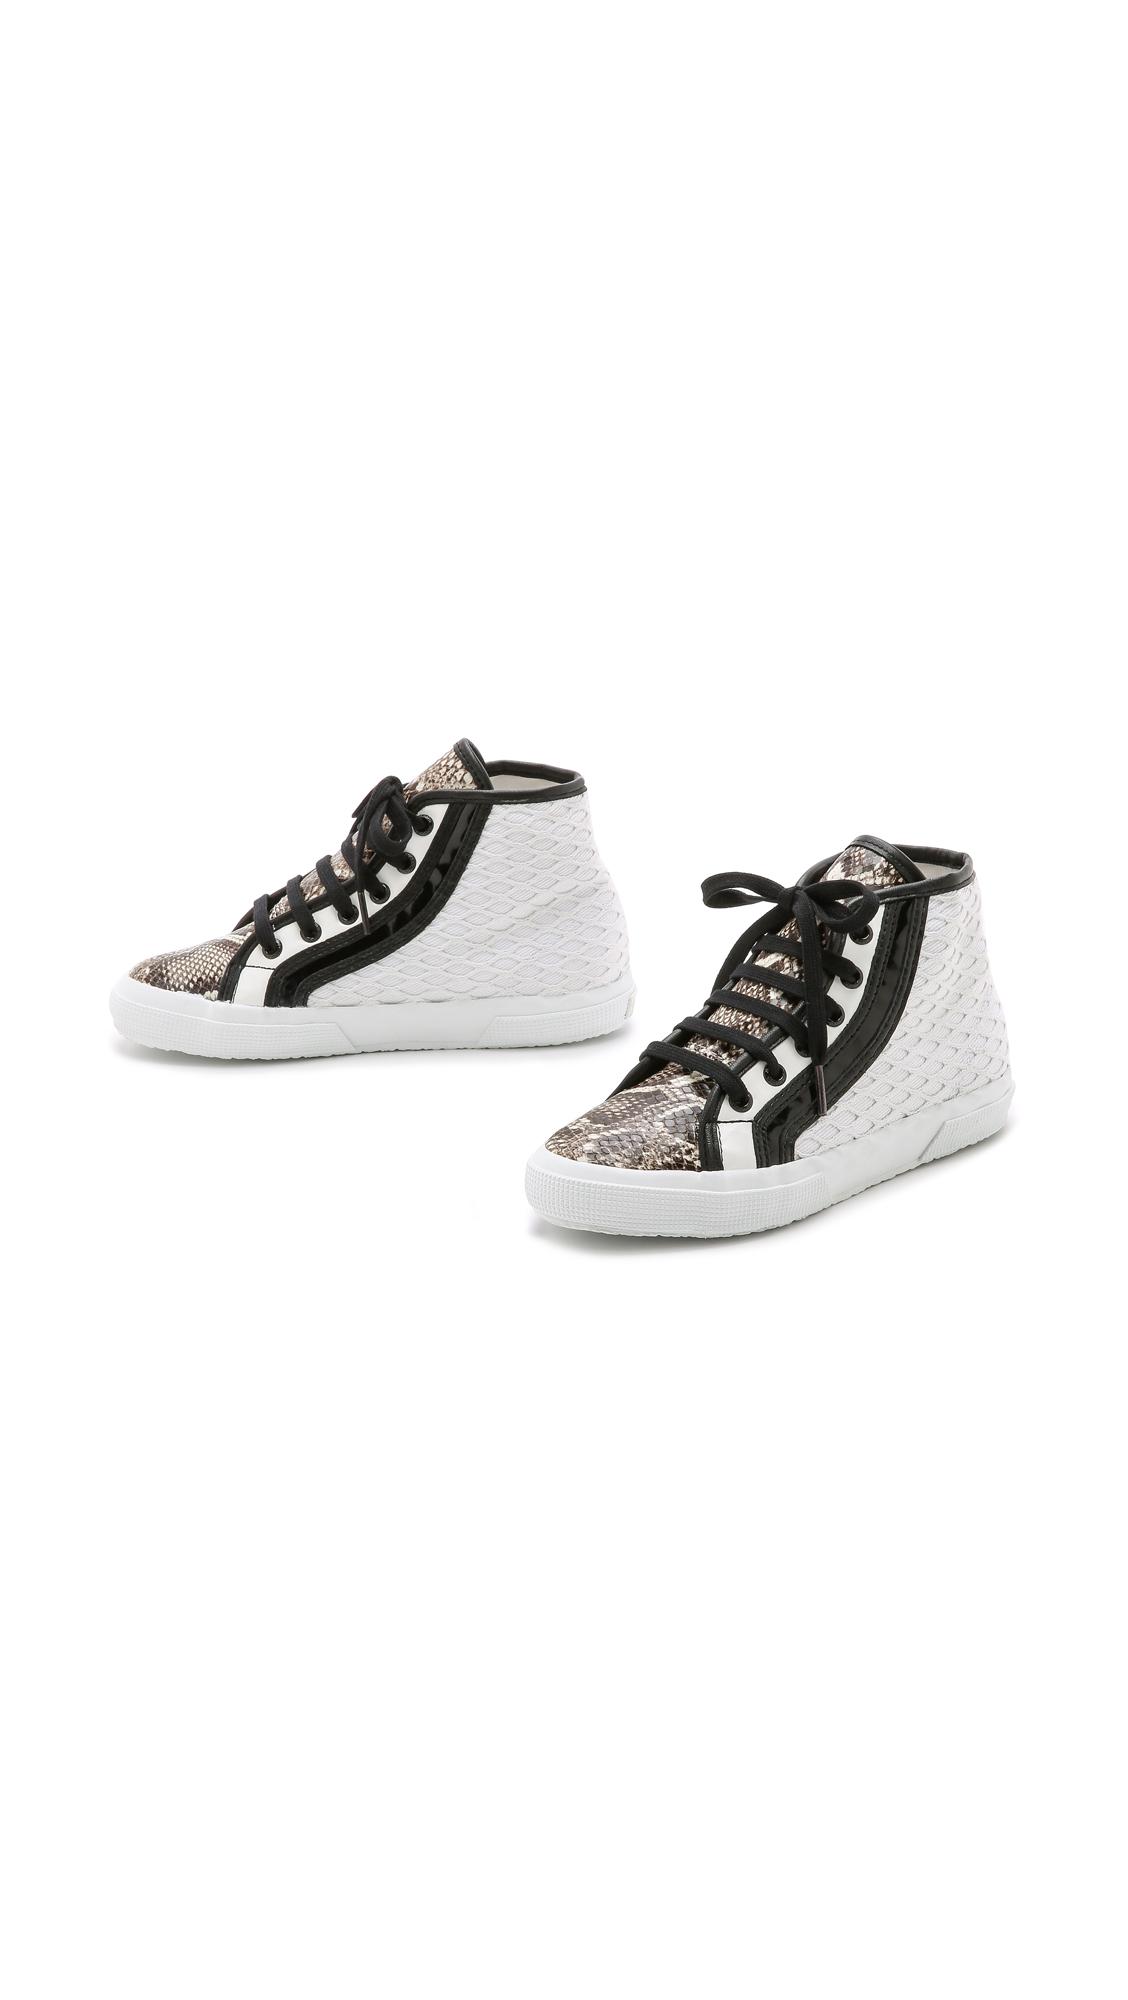 Superga Rodarte X Net Snake High Top Sneakers - White Multi